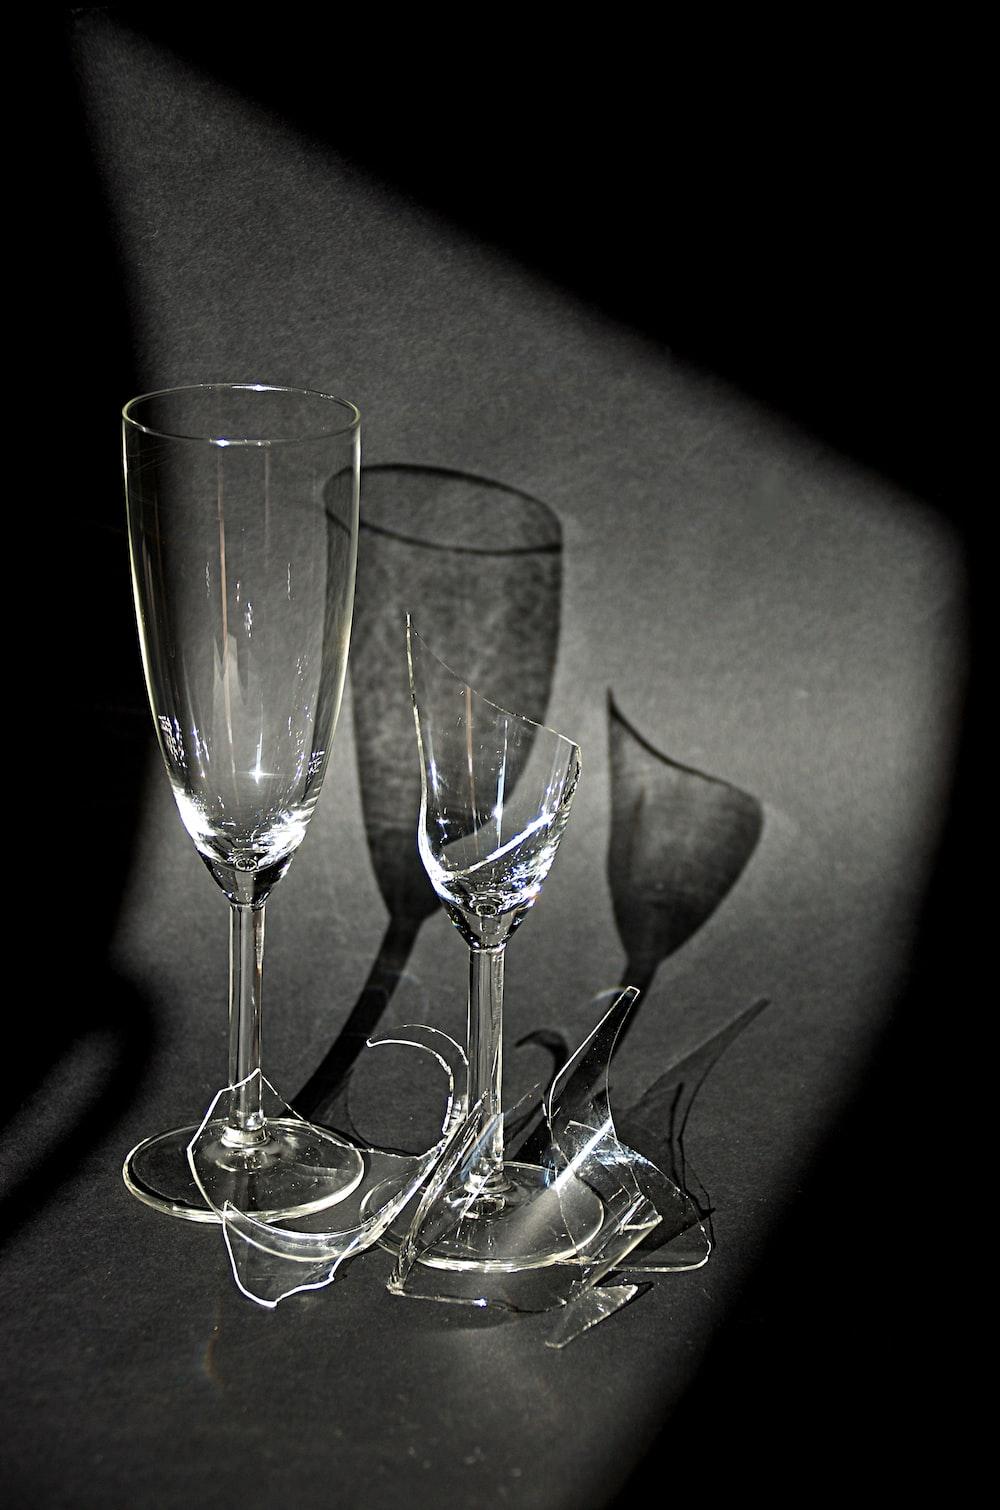 broken champagne flute